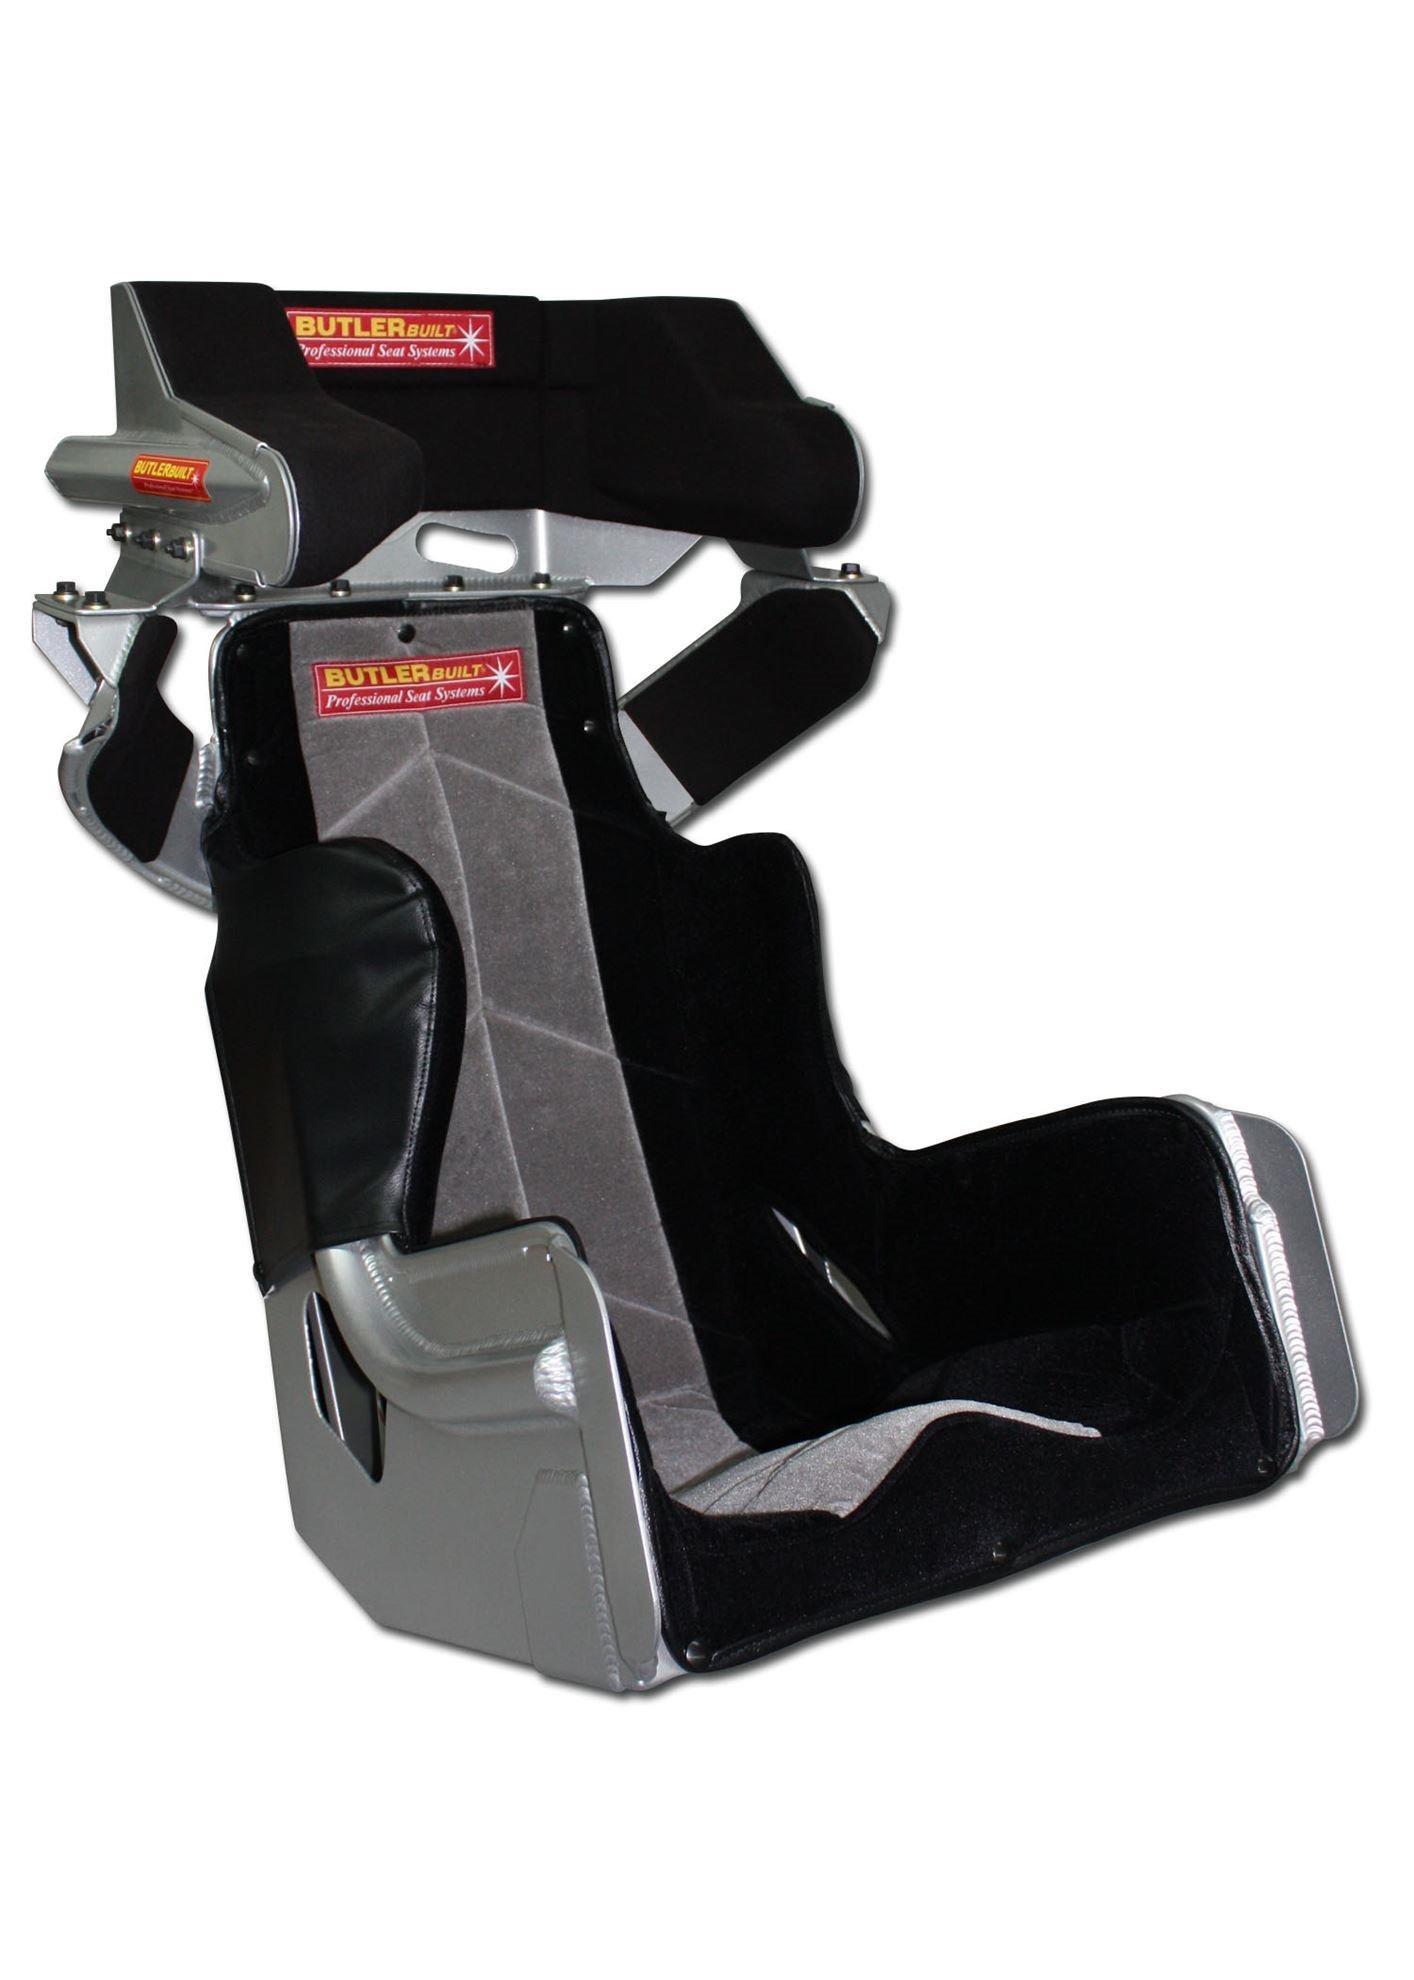 ButlerBuilt Advantage II Speedway 25° Layback Seat